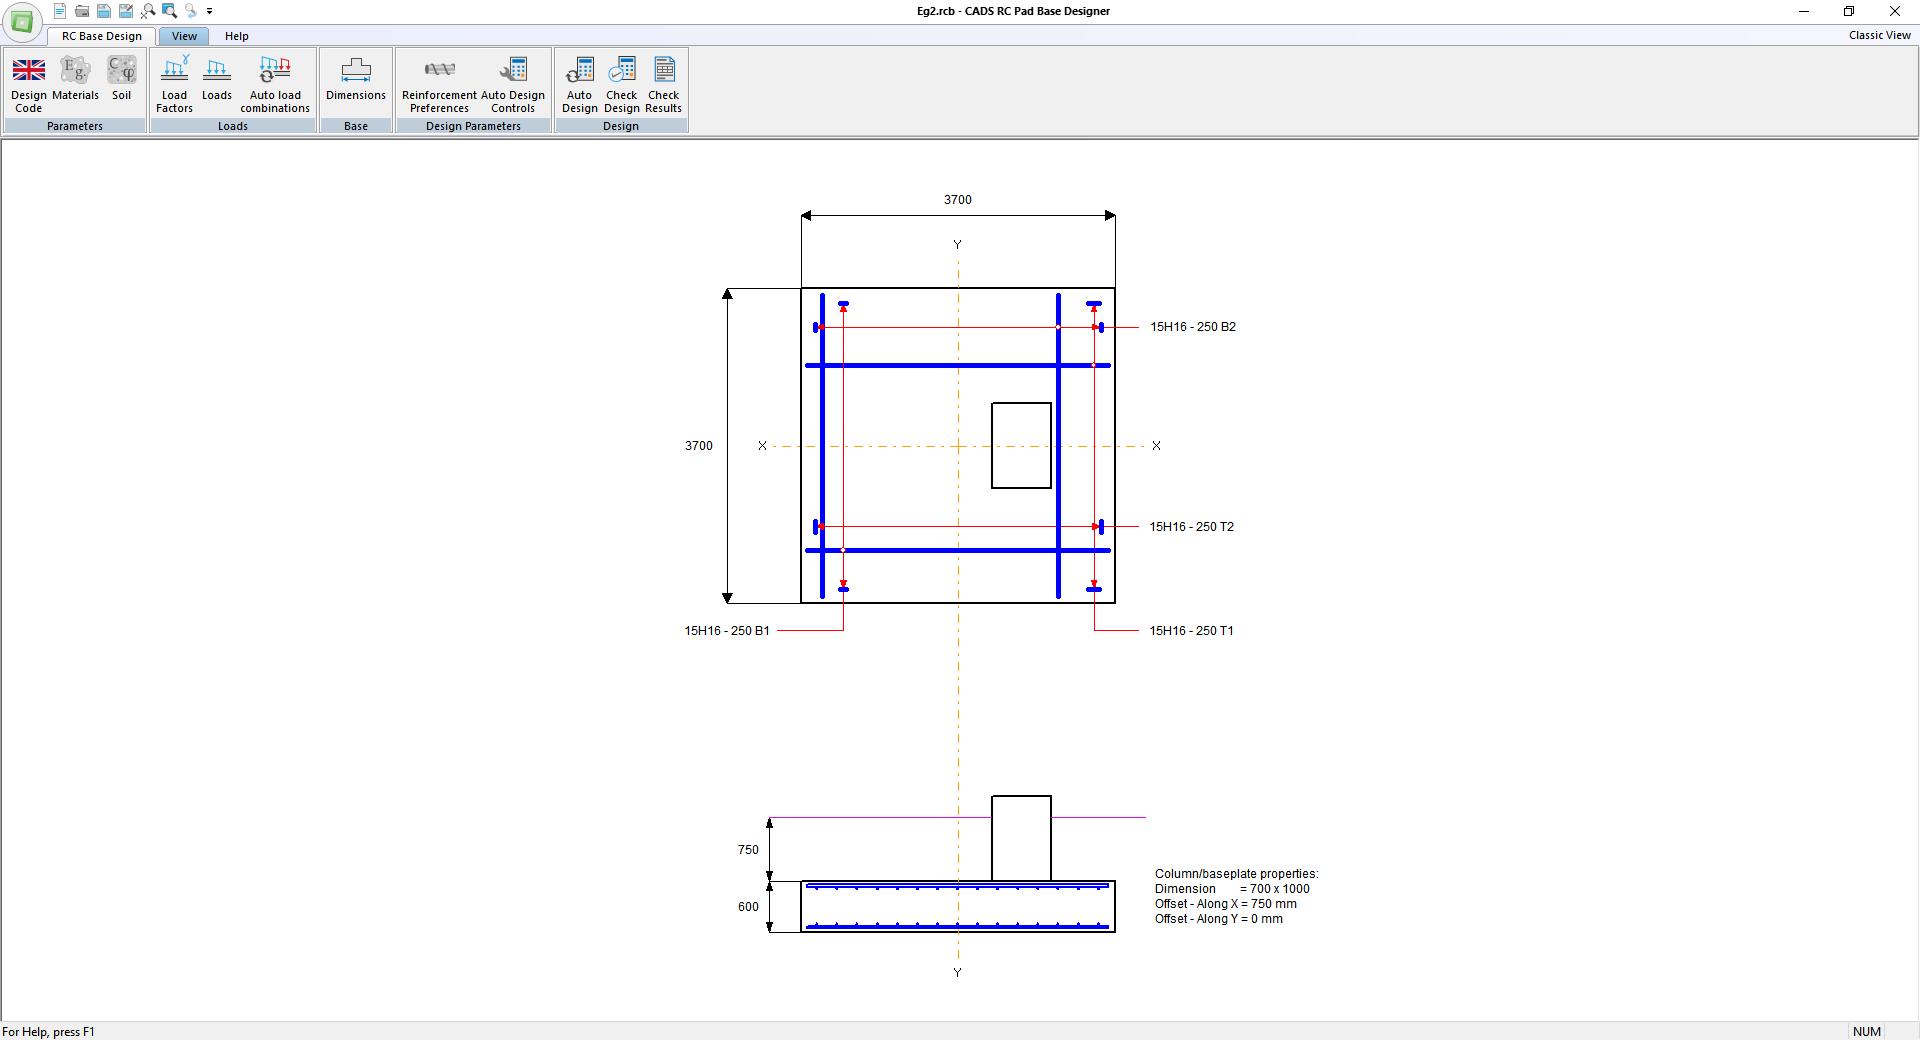 CADS RC Pad Base Designer - Main window layout